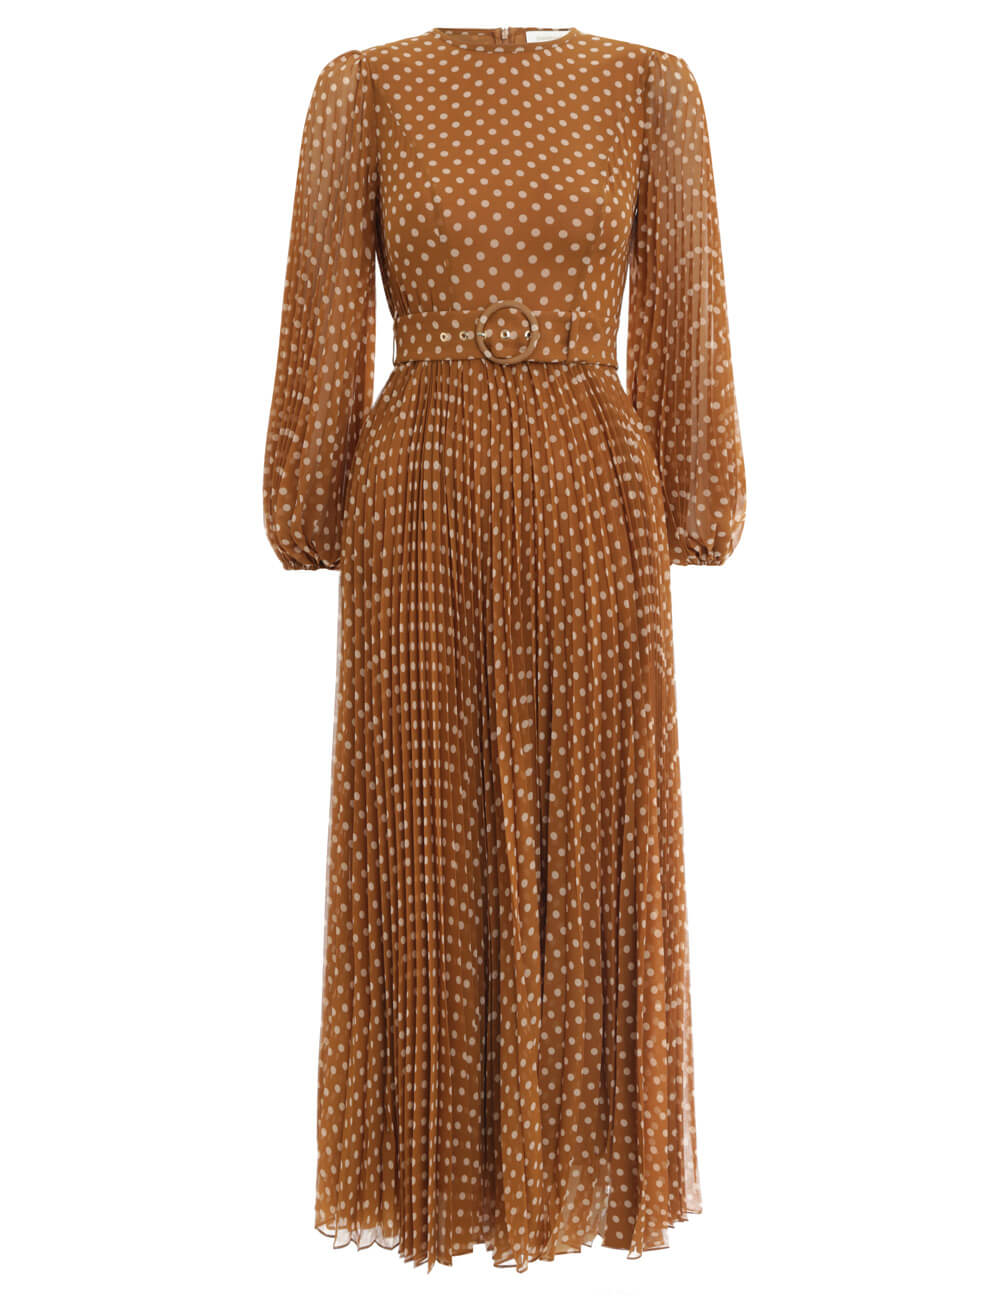 Espionage Sunray Track Dress